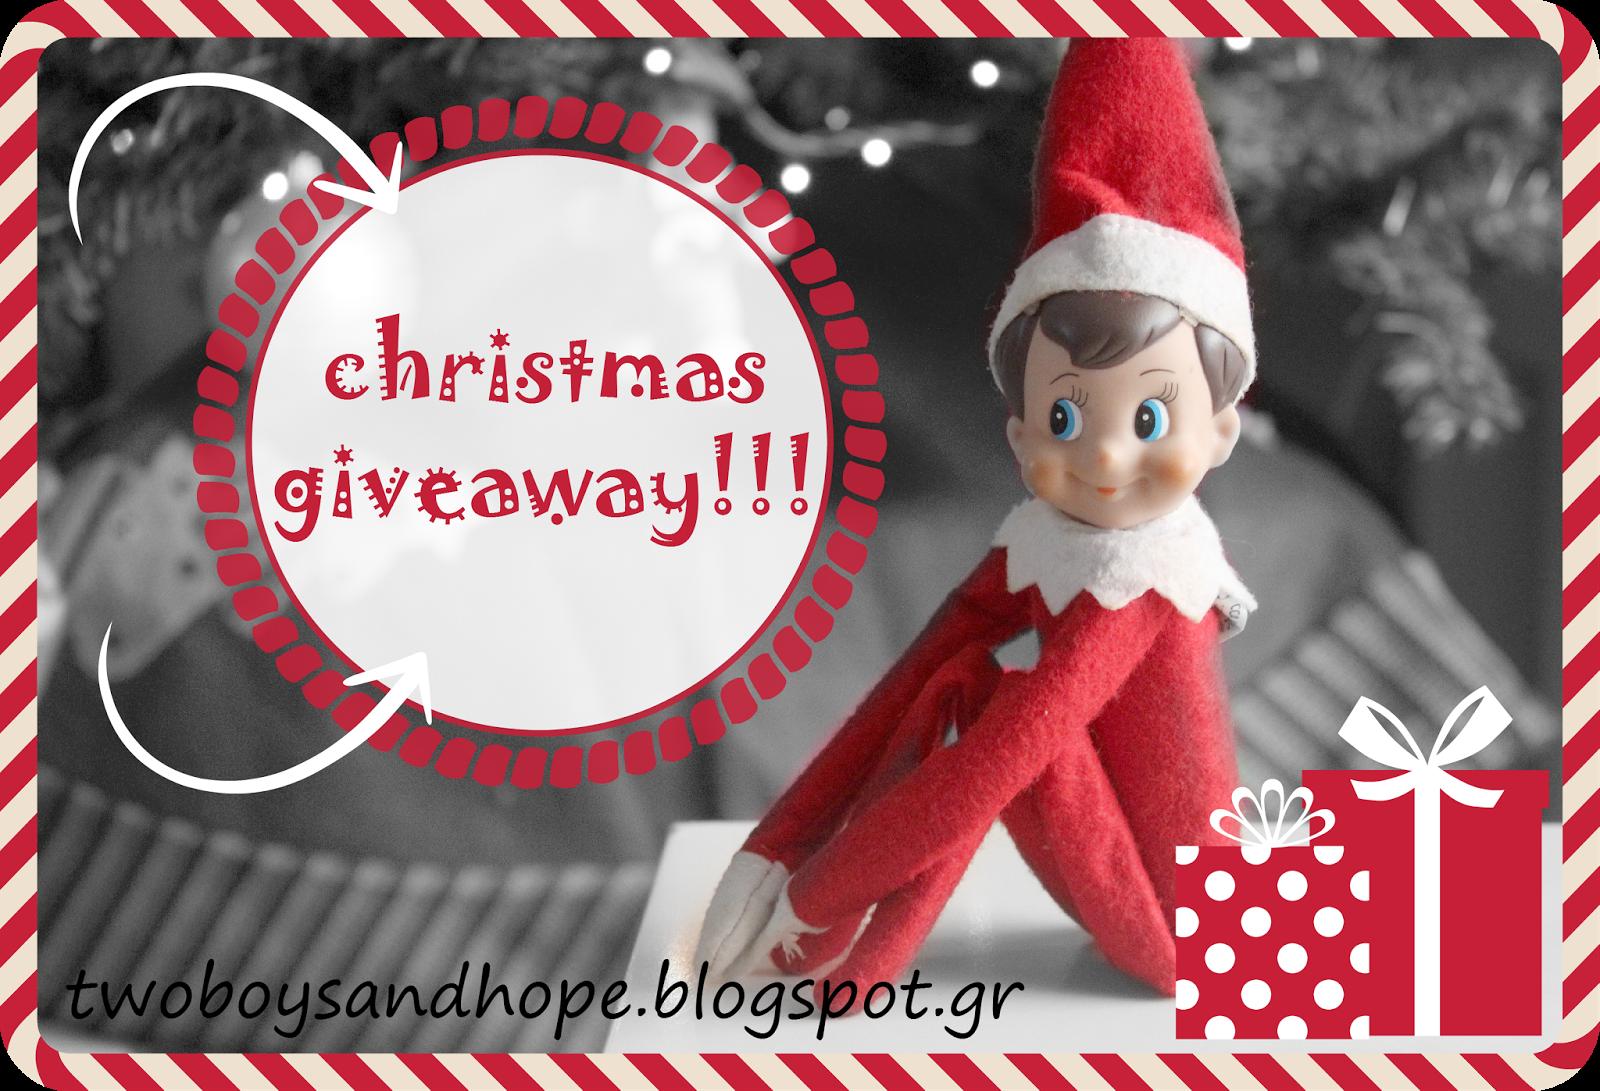 Christmas Giveaway – 2 ξωτικά στο ράφι αναζητούν οικογένεια!!